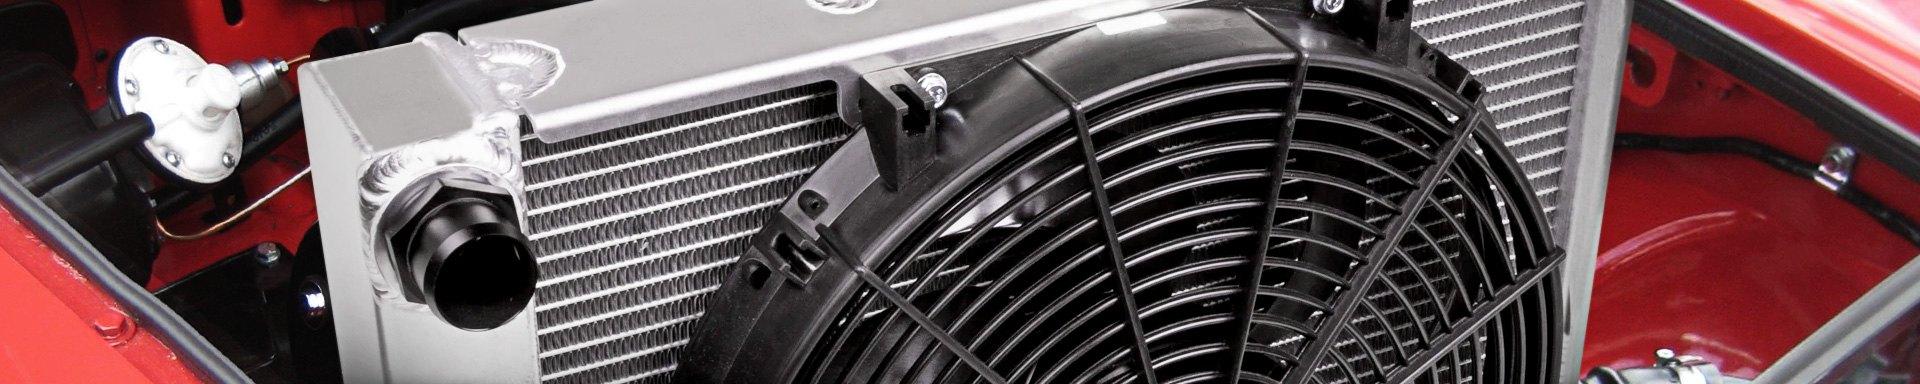 Replacement Engine Cooling Parts | Radiators, Fans, Pumps — CARiD.com